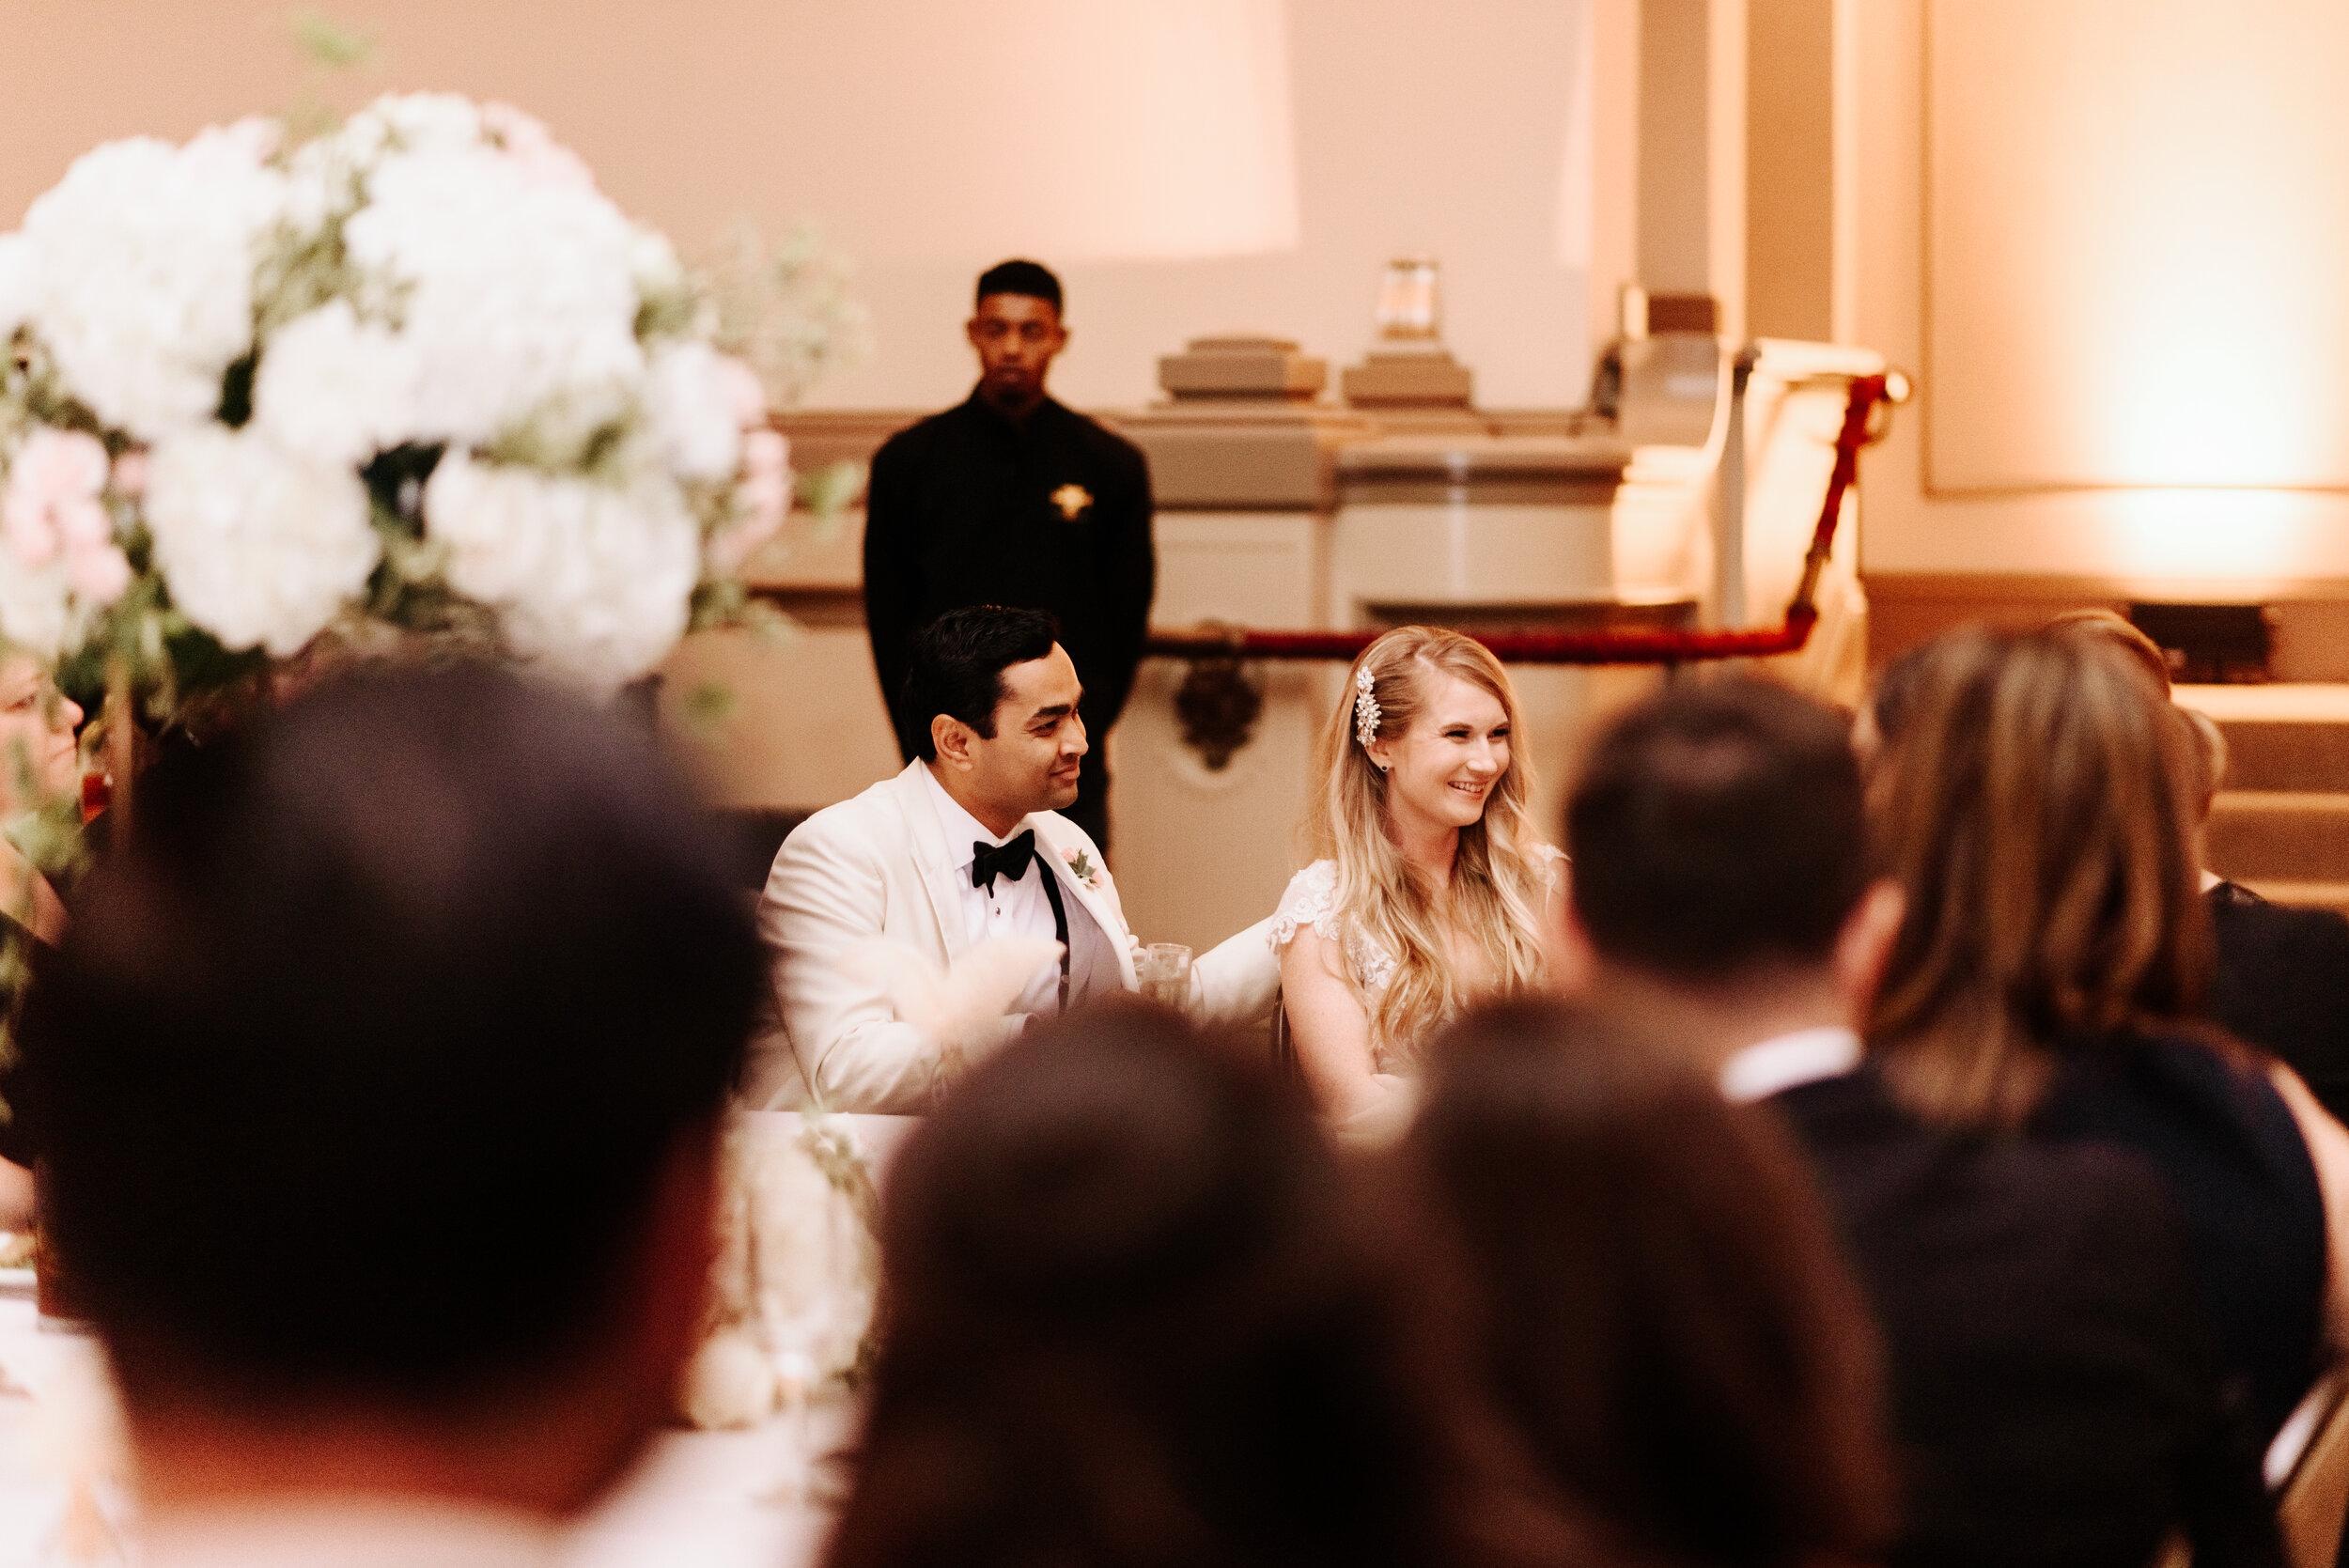 Cassie-Mrunal-Wedding-Quirk-Hotel-John-Marshall-Ballrooms-Richmond-Virginia-Photography-by-V-99.jpg